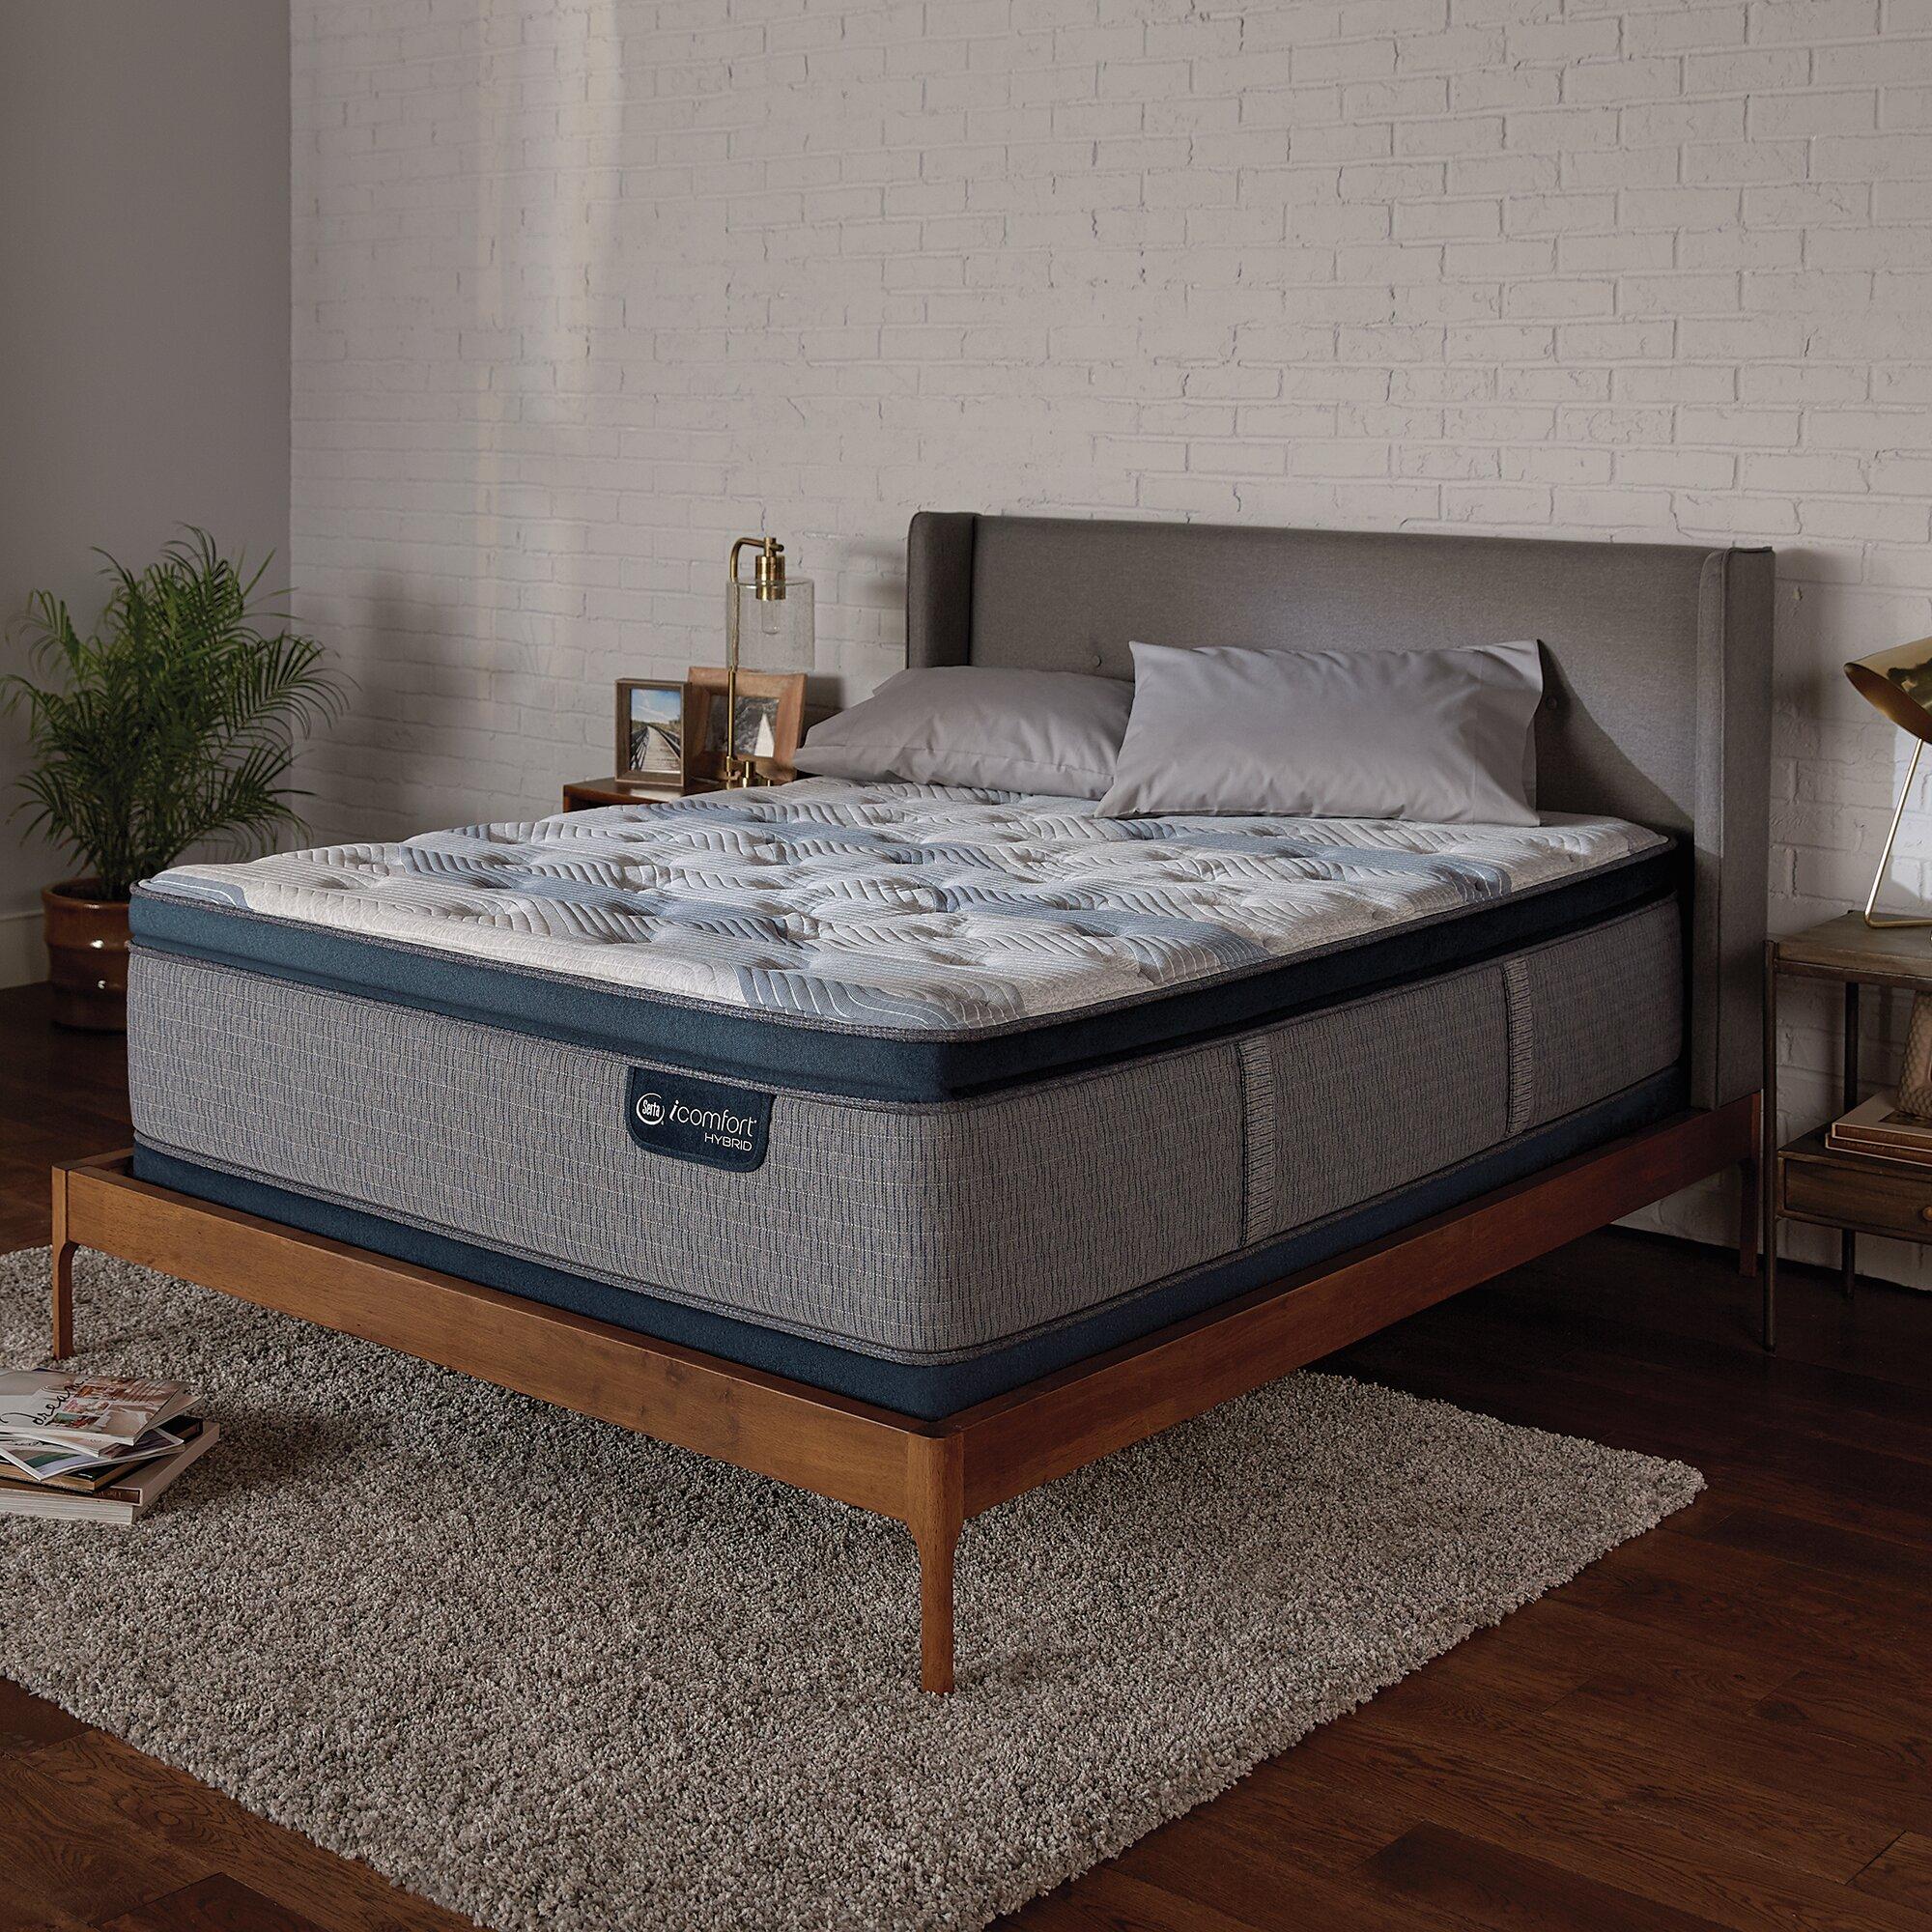 Serta Icomfort 300 14 Plush Pillow Top Hybrid Mattress Reviews Wayfair